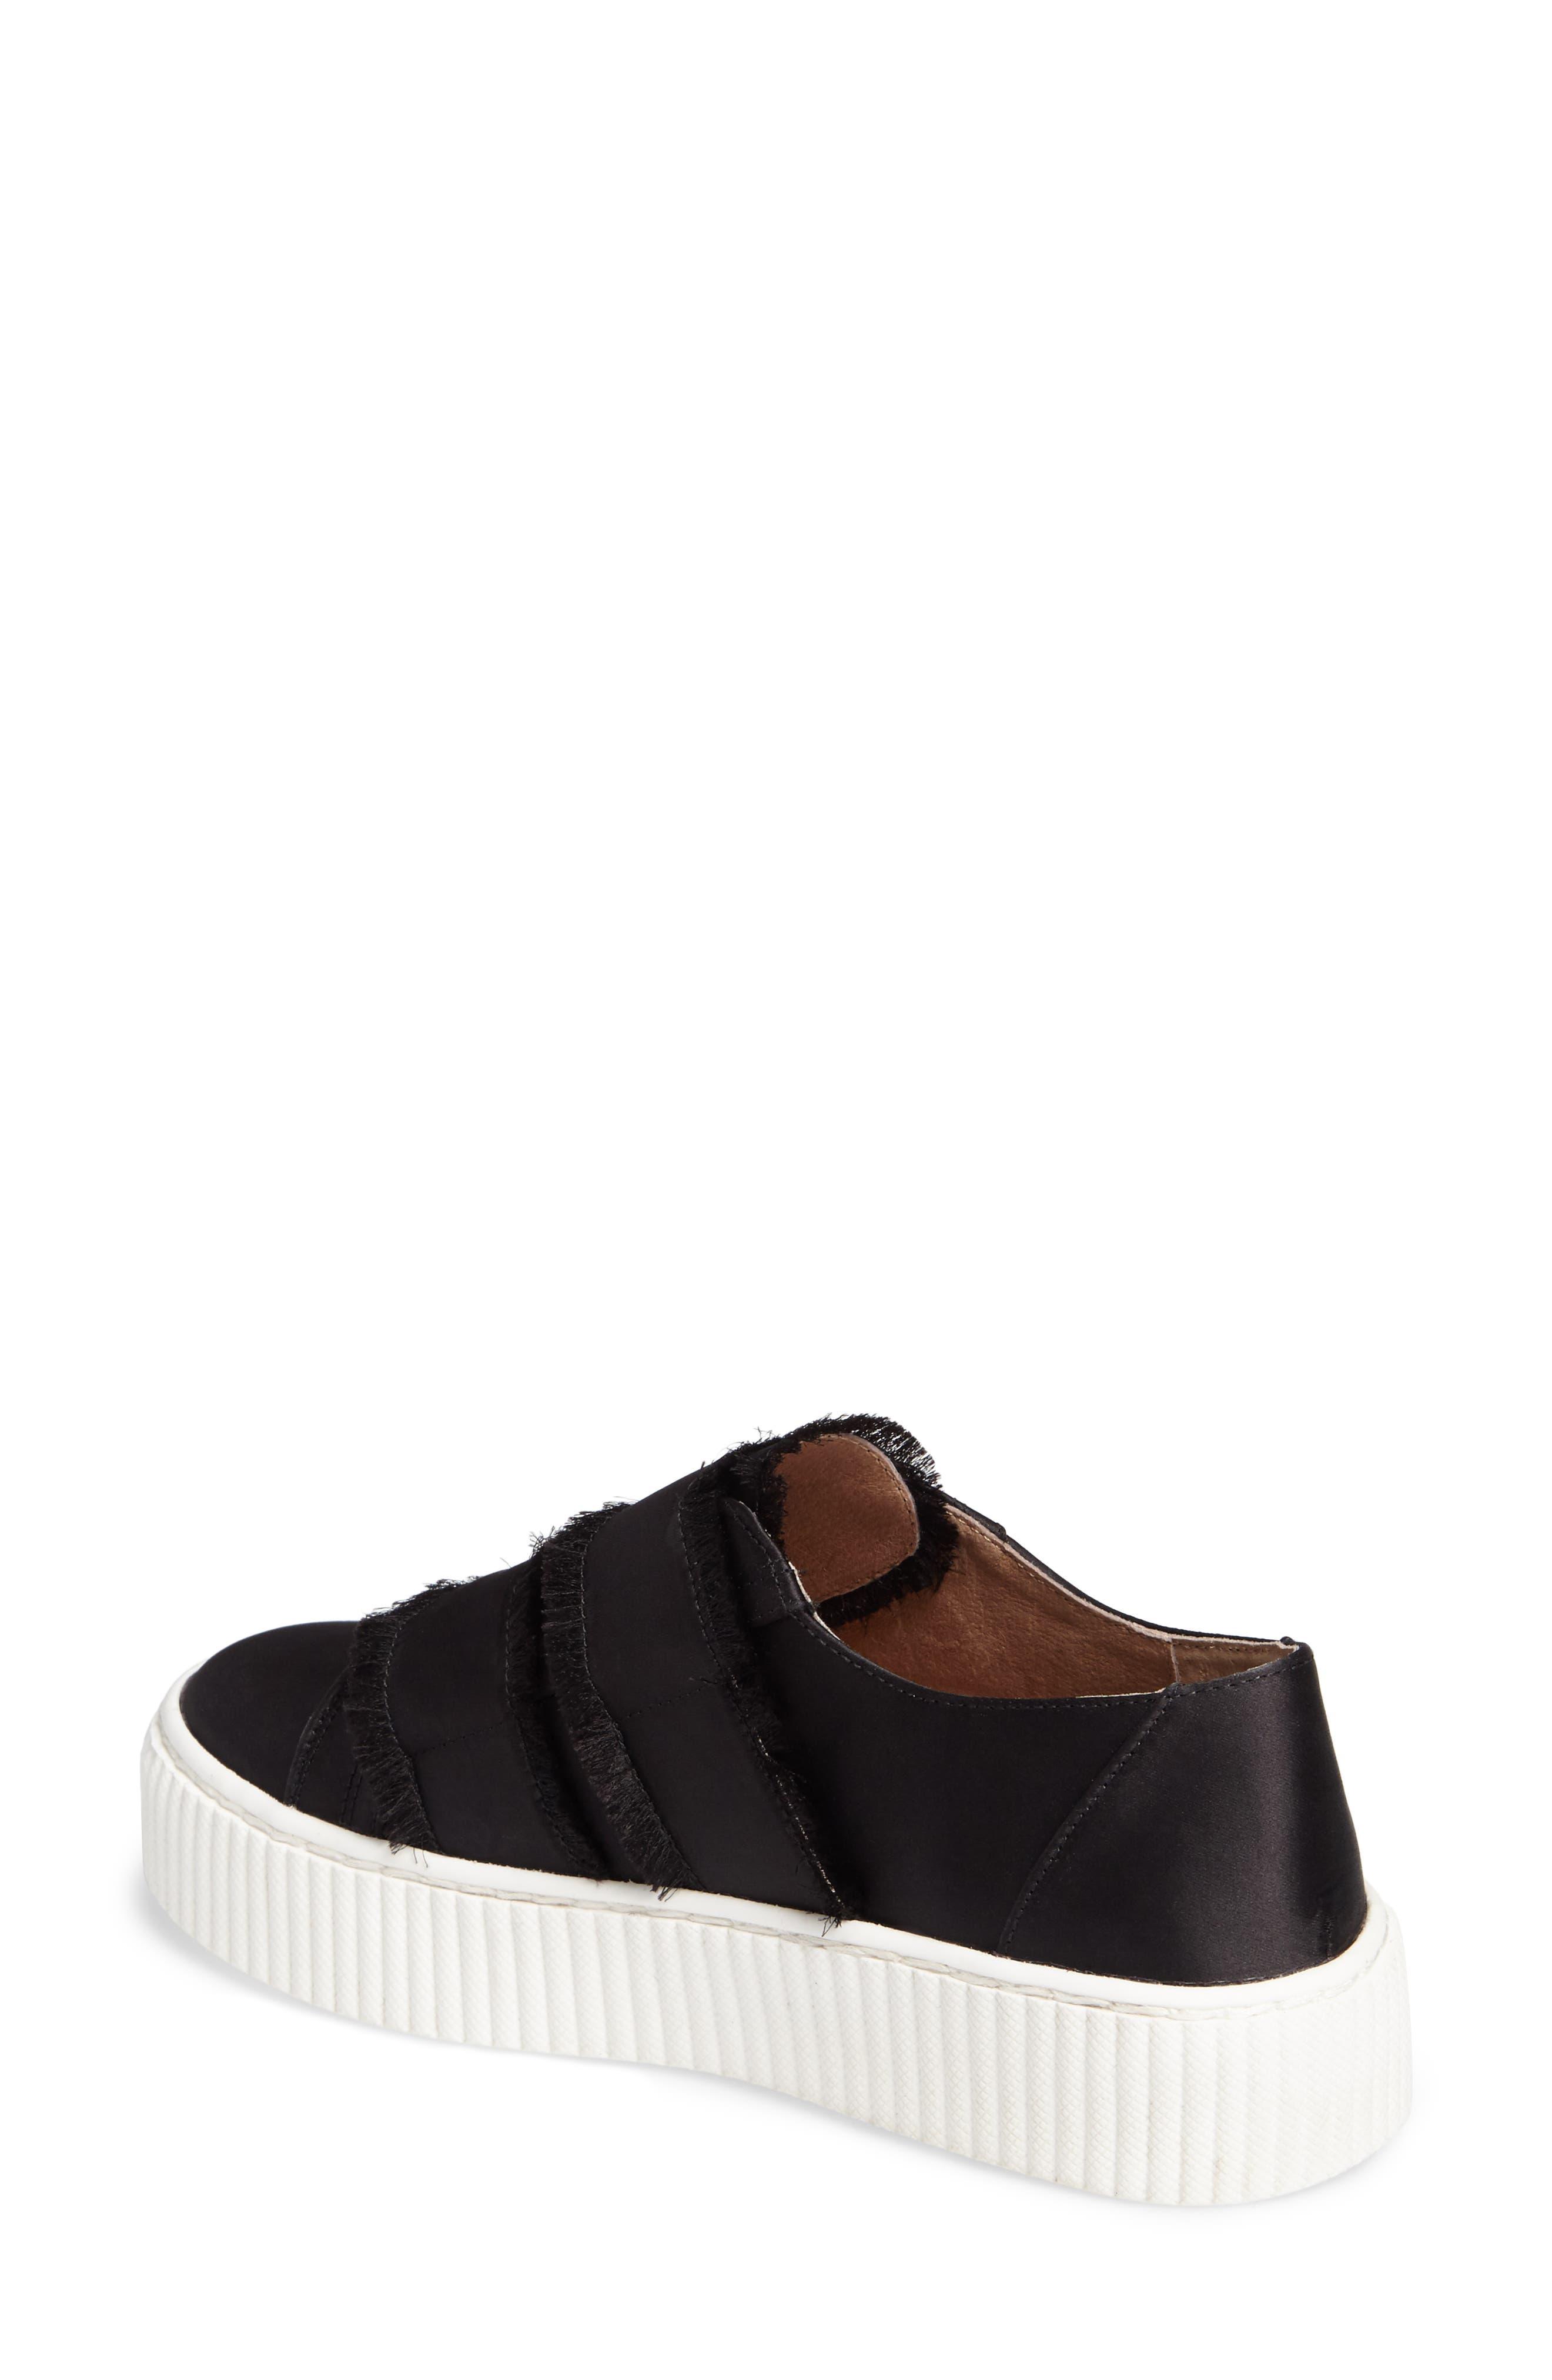 Elder Fringed Platform Sneaker,                             Alternate thumbnail 2, color,                             Black